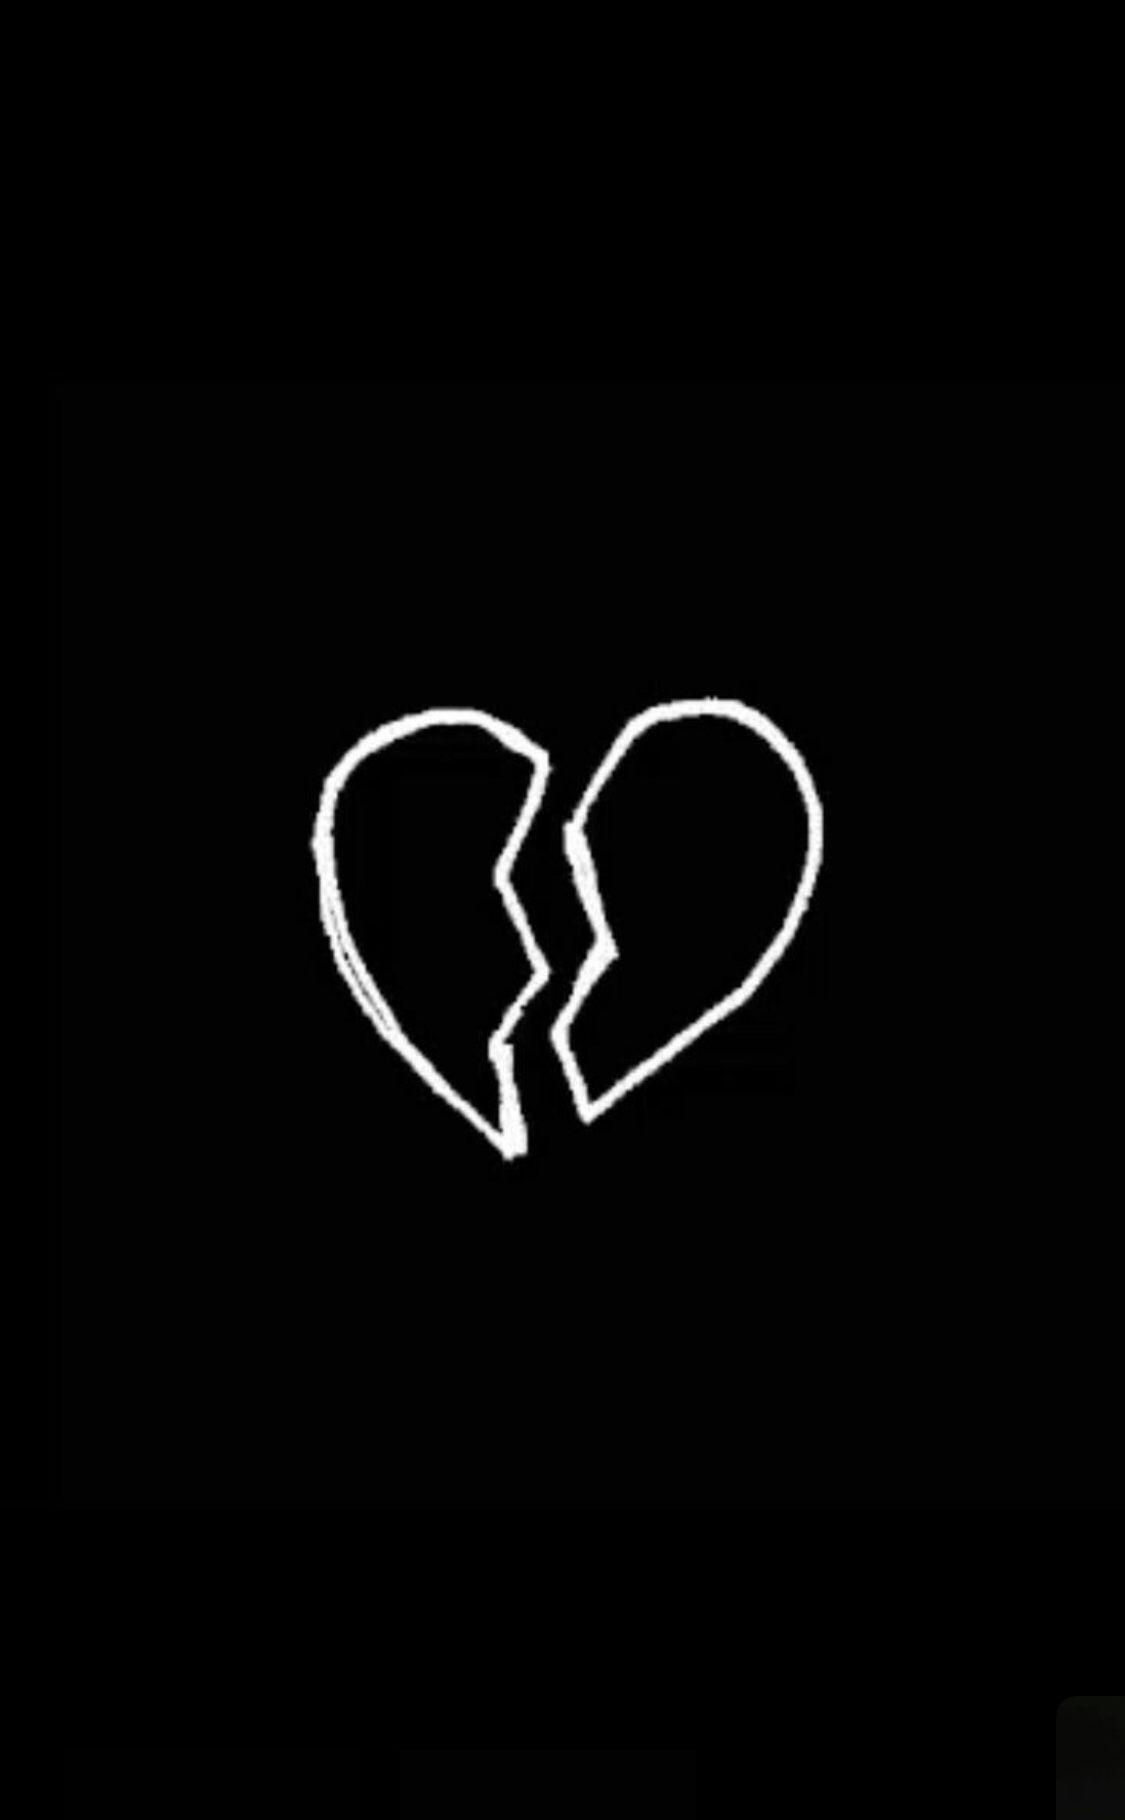 Broken Heart Wallpaper Heart Wallpaper Black Hearts Club Wallpaper